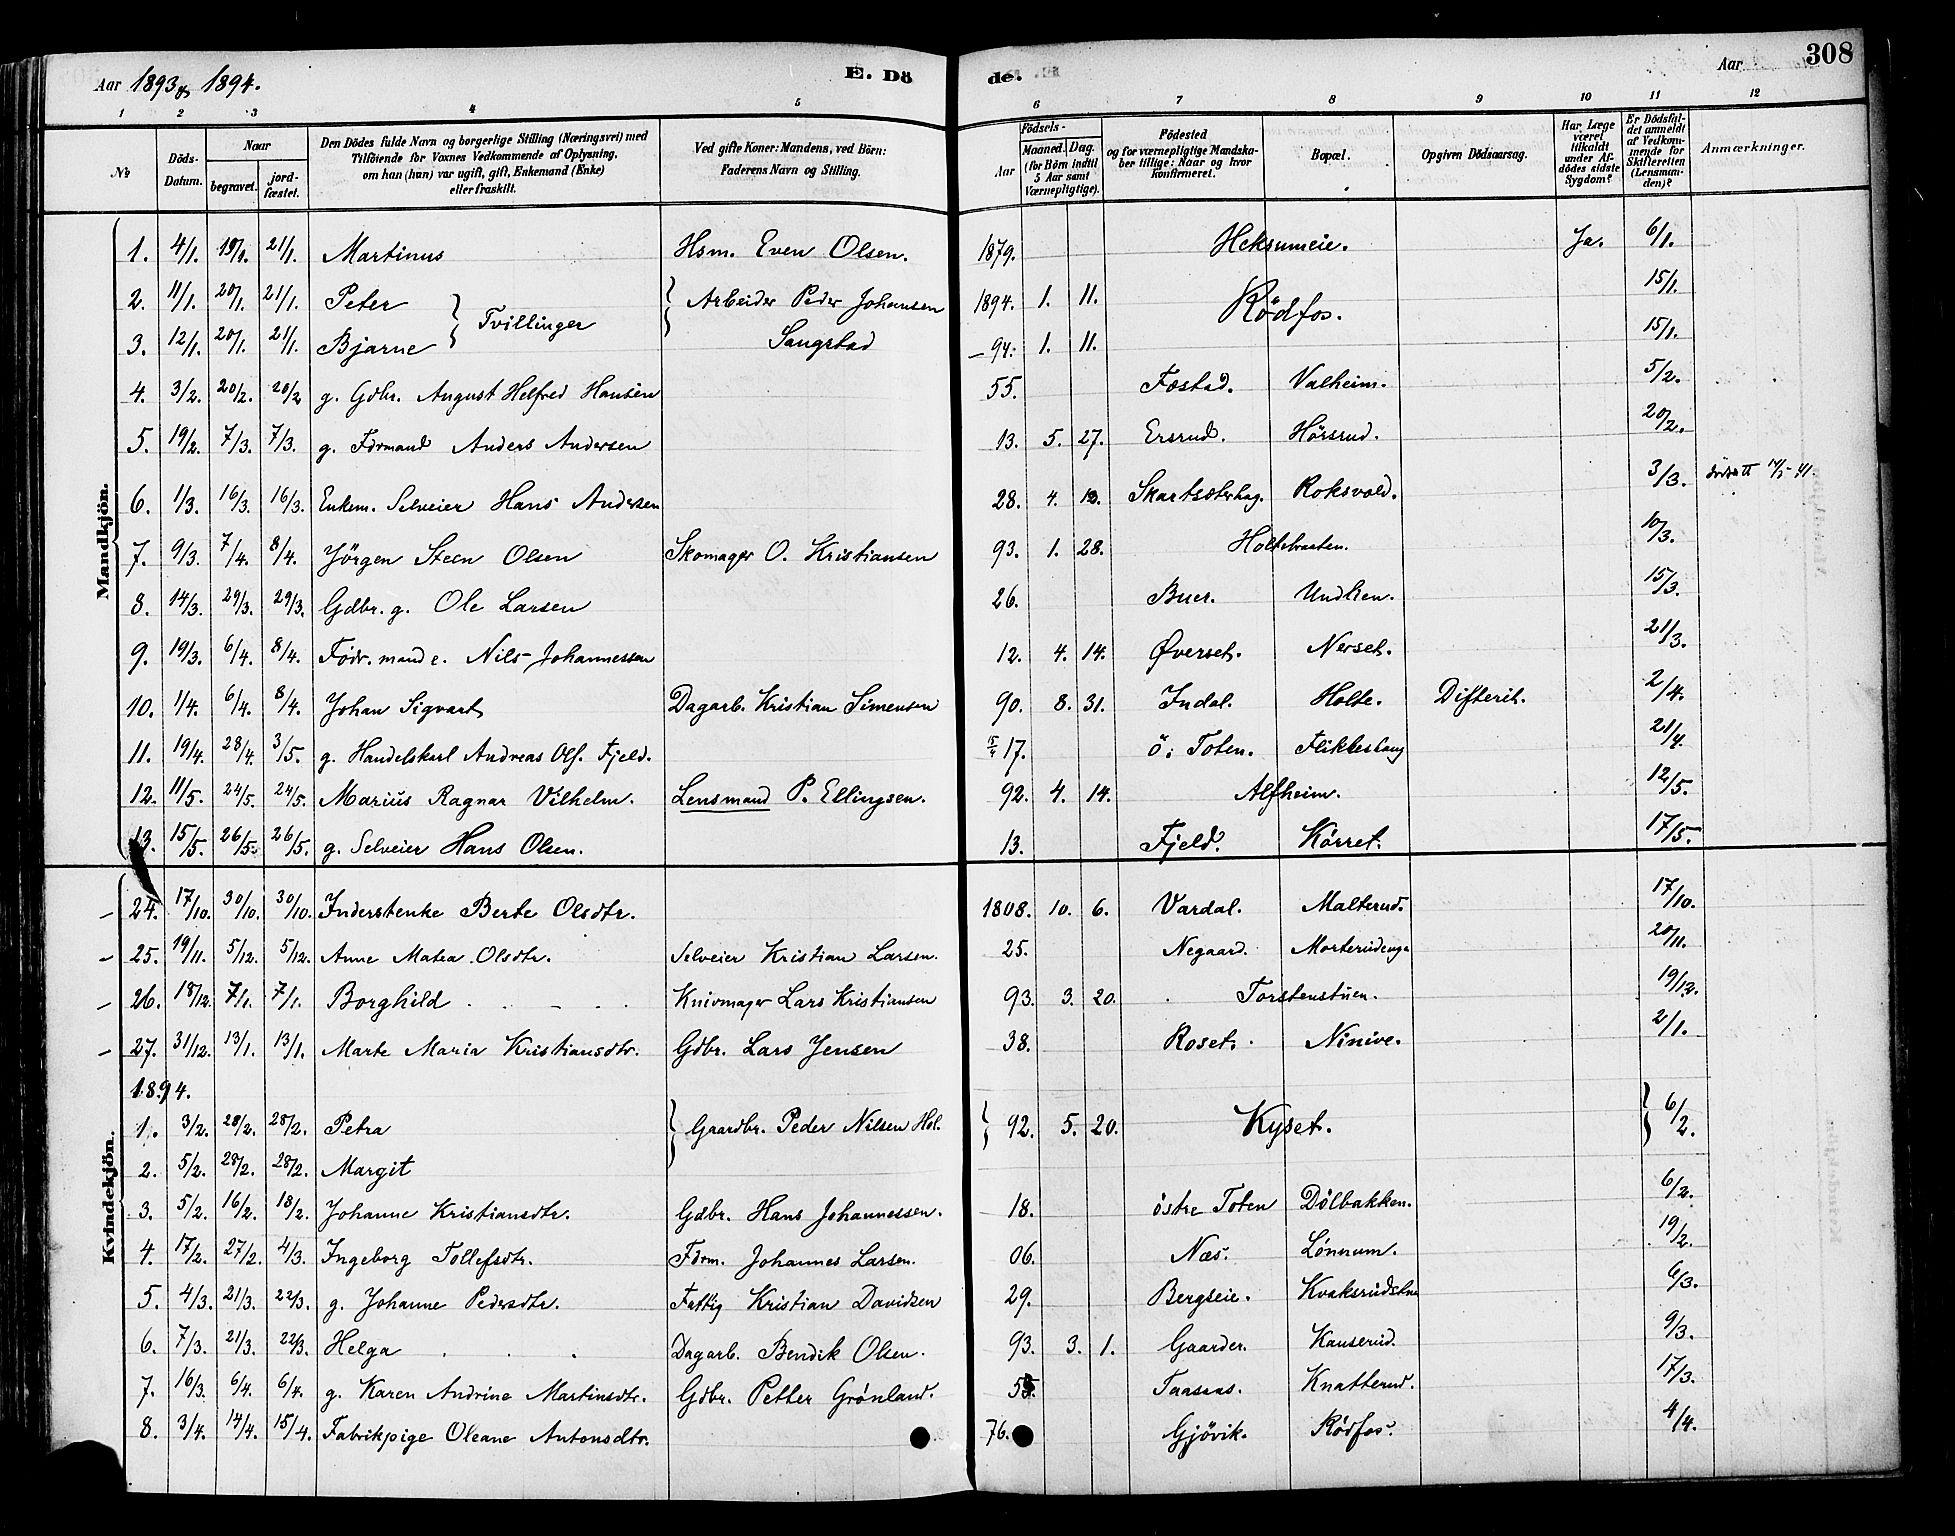 SAH, Vestre Toten prestekontor, H/Ha/Haa/L0009: Ministerialbok nr. 9, 1878-1894, s. 308